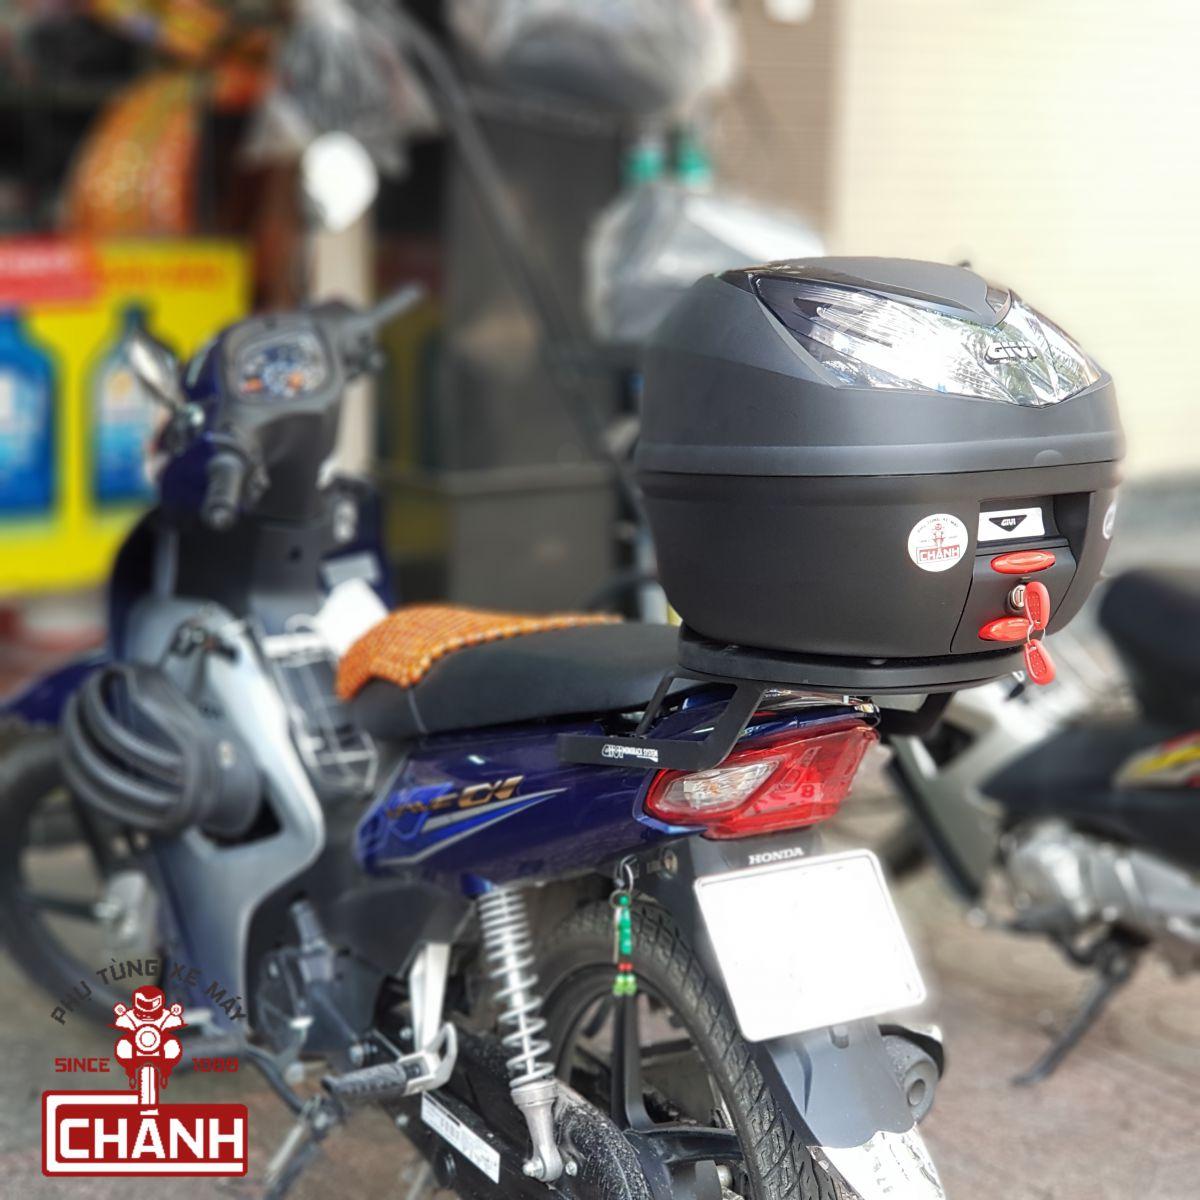 thung-sau-xe-may-loai-nho-chinh-hang-givi-3b